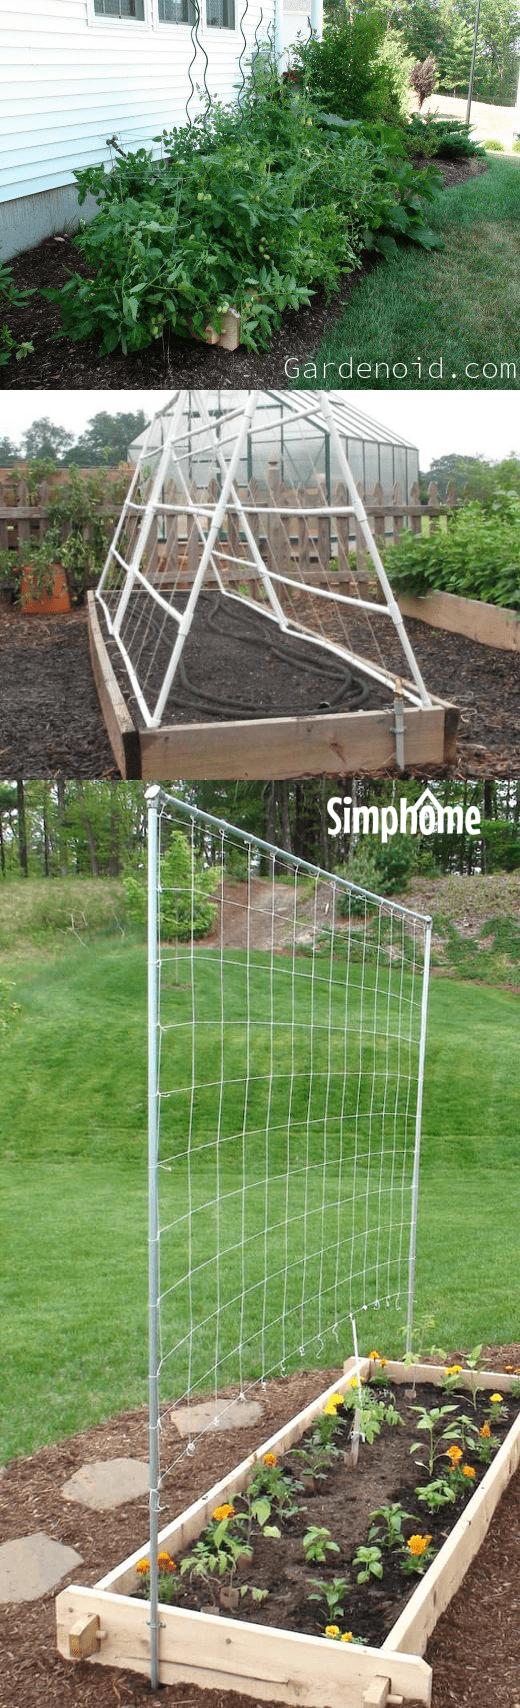 Simphome.com .1.String Trellis Project idea